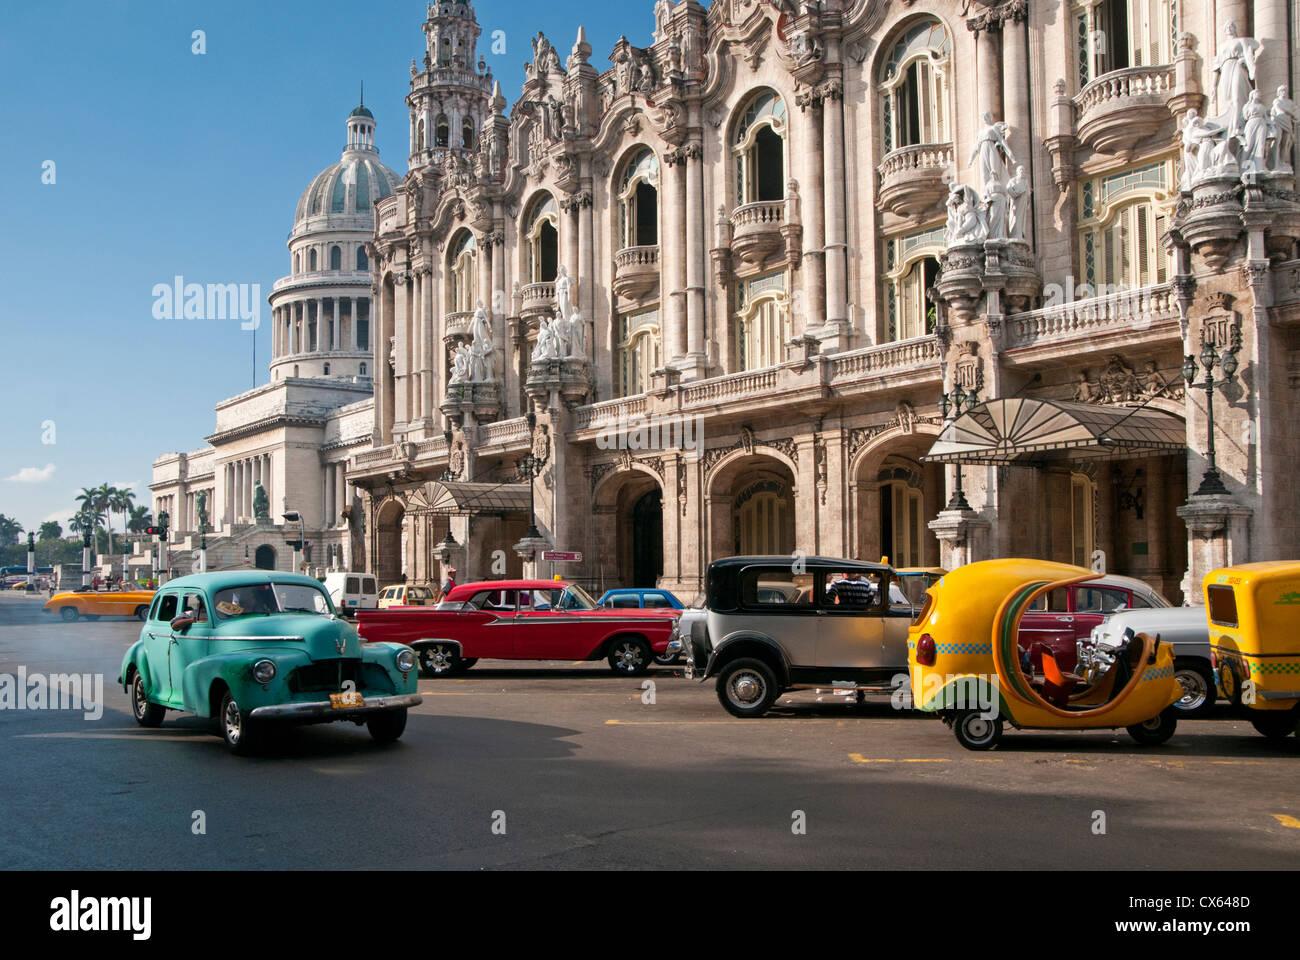 Amerikanische Autos vorbei Capitolio Altbau und Gran Teatro De La Habana, Paseo de Marti, Habana Vieja, Havanna, Stockbild